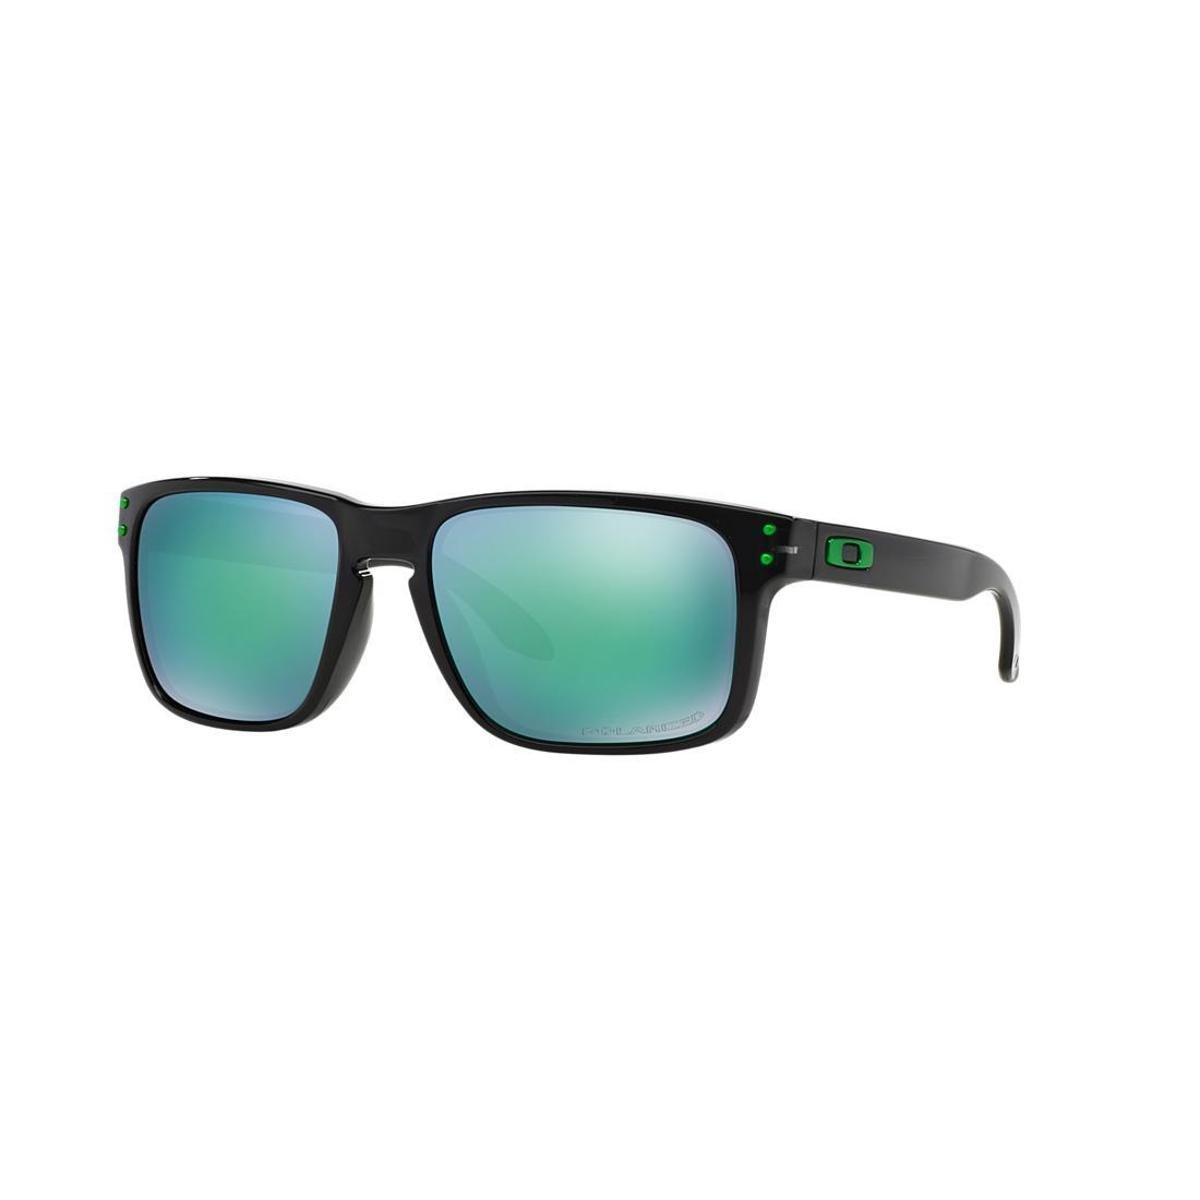 Óculos de Sol Oakley OO9102 Holbrook - Compre Agora   Zattini 56fd029026